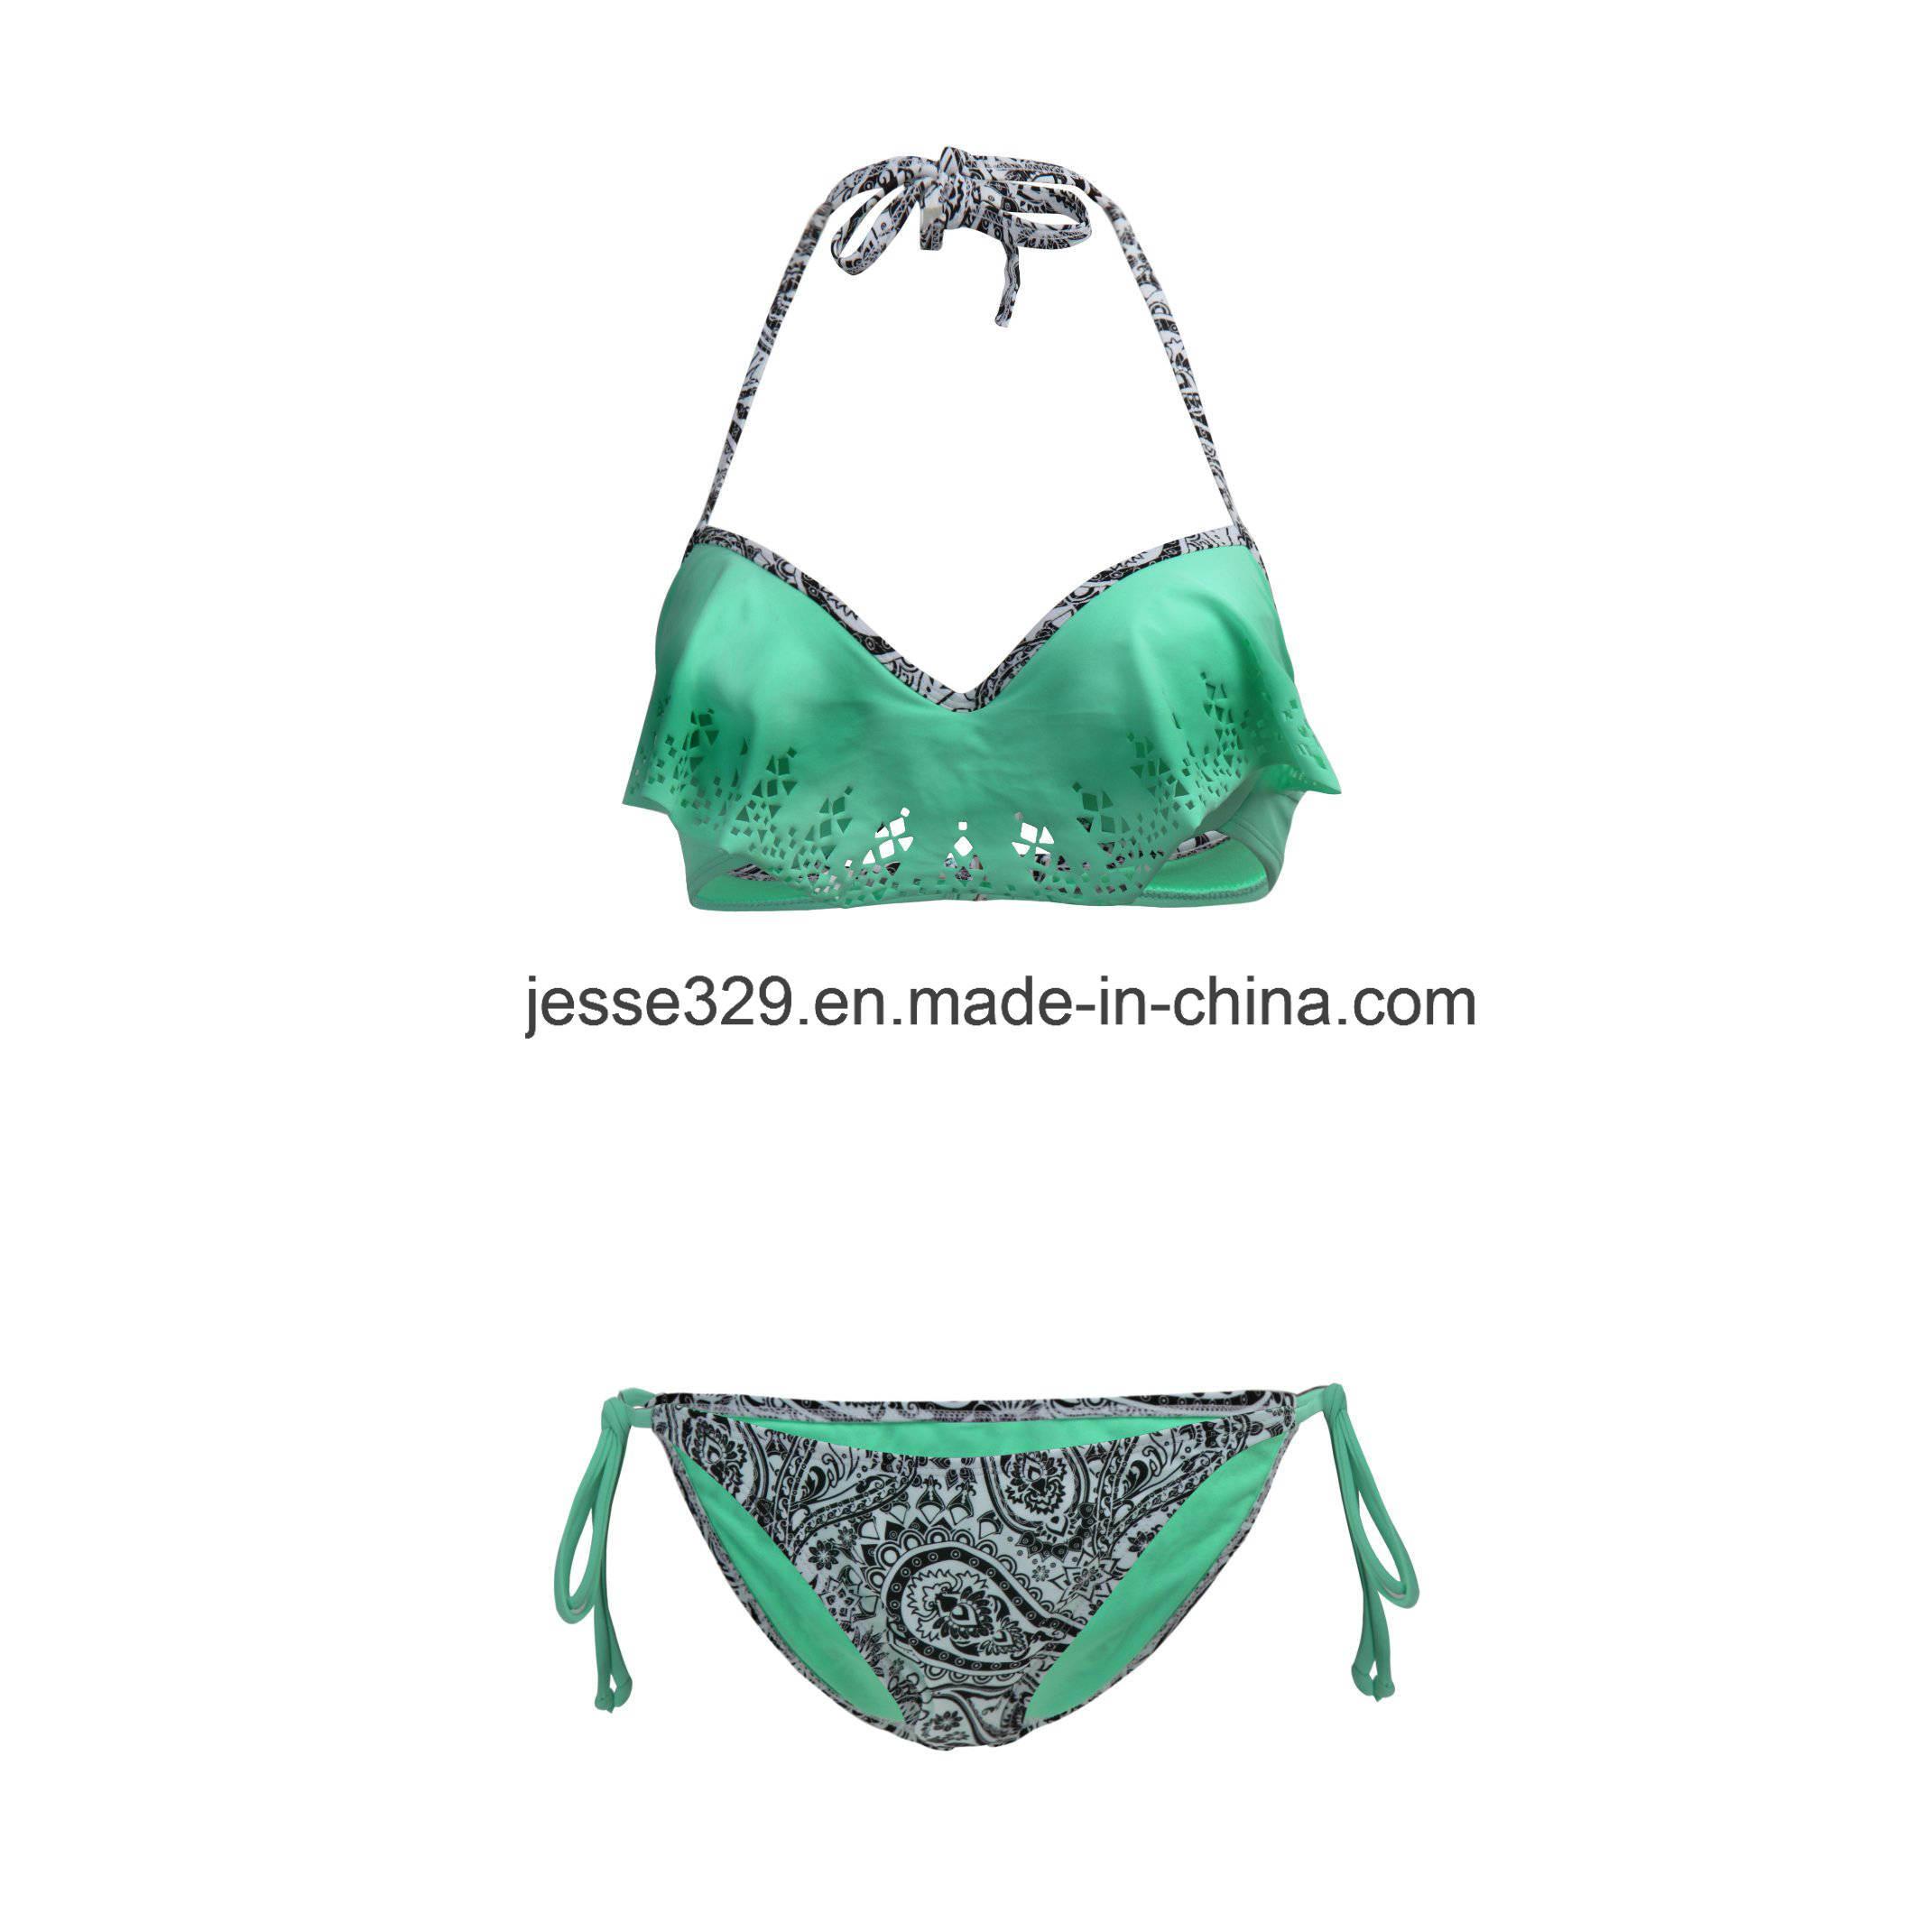 Sexy Popular Laser Cut Two-Piece Bikini Swimwear